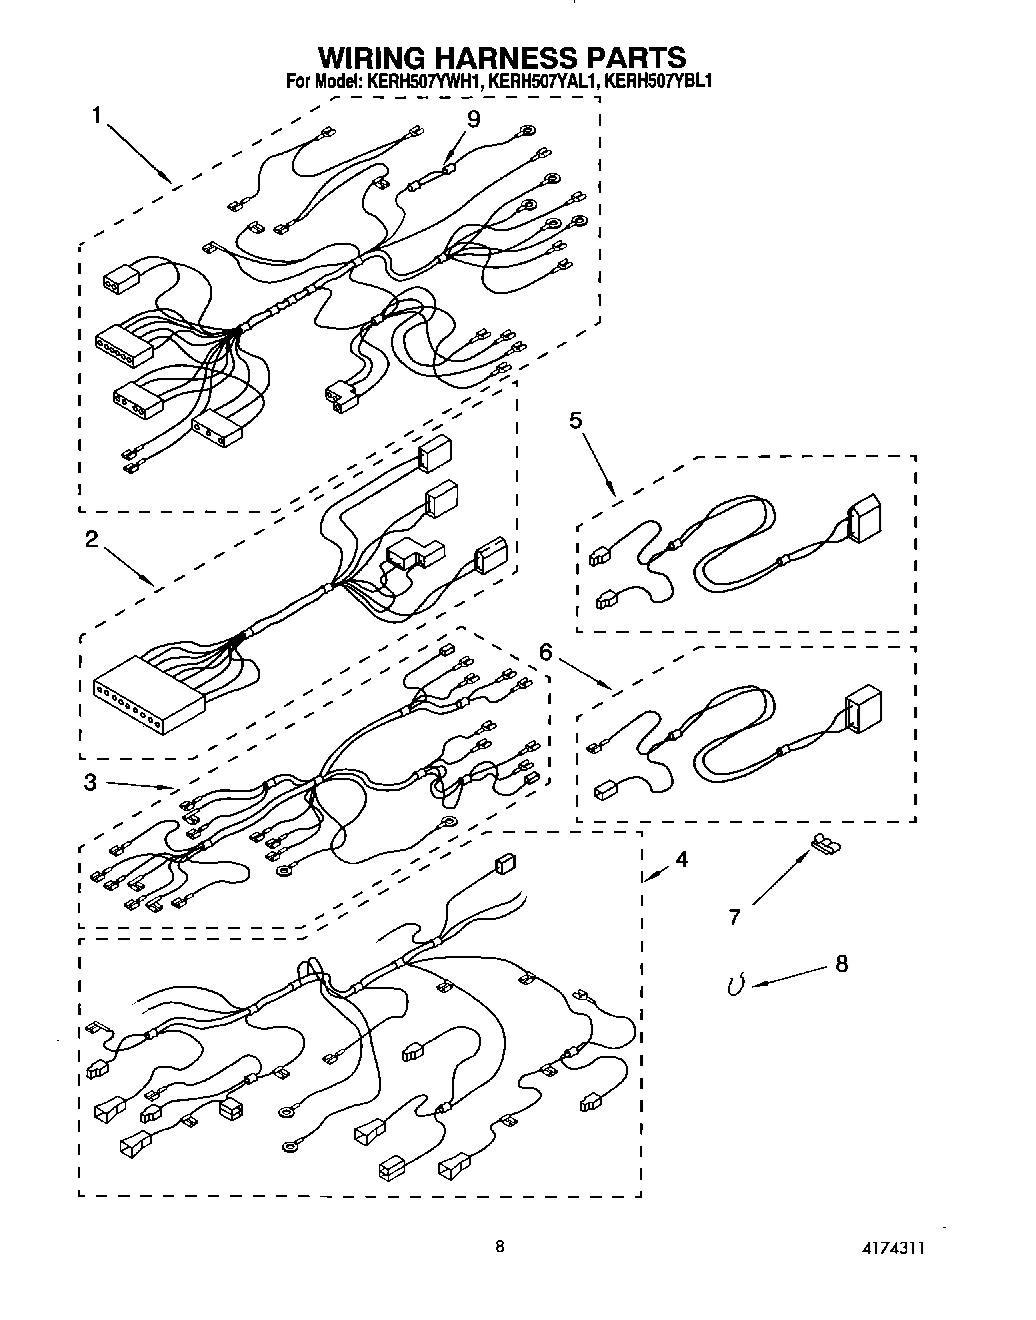 WhirlpoolImg_19000101 20150716_00108482?width\=2000 dpst rocker switch wiring diagram,rocker free download printable  at soozxer.org